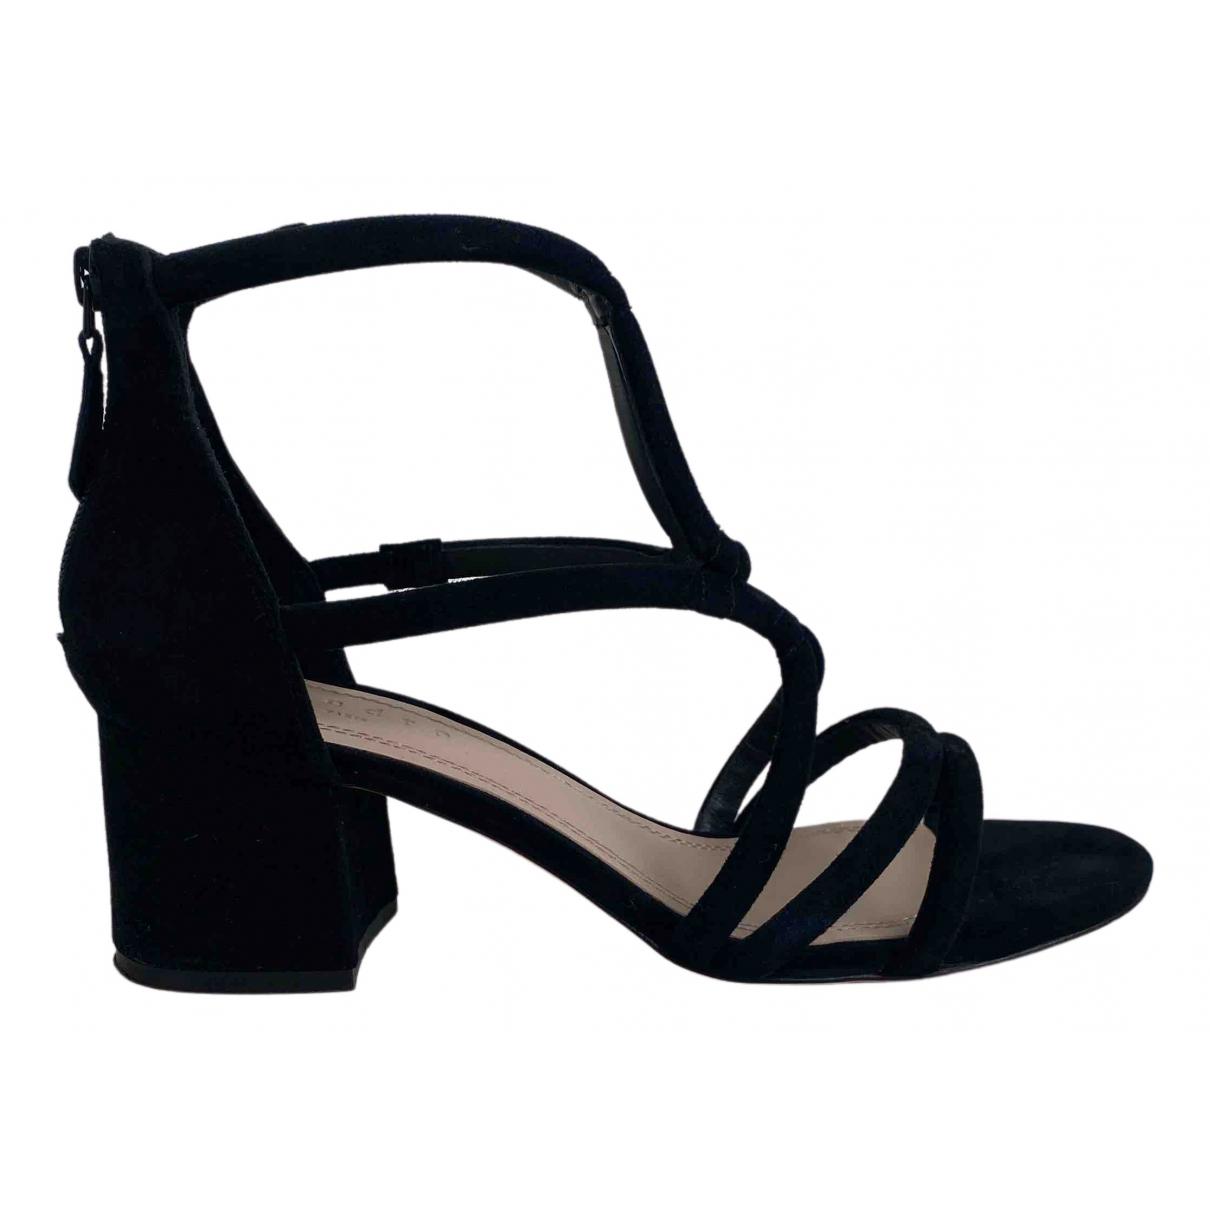 Sandro N Black Suede Sandals for Women 39 EU